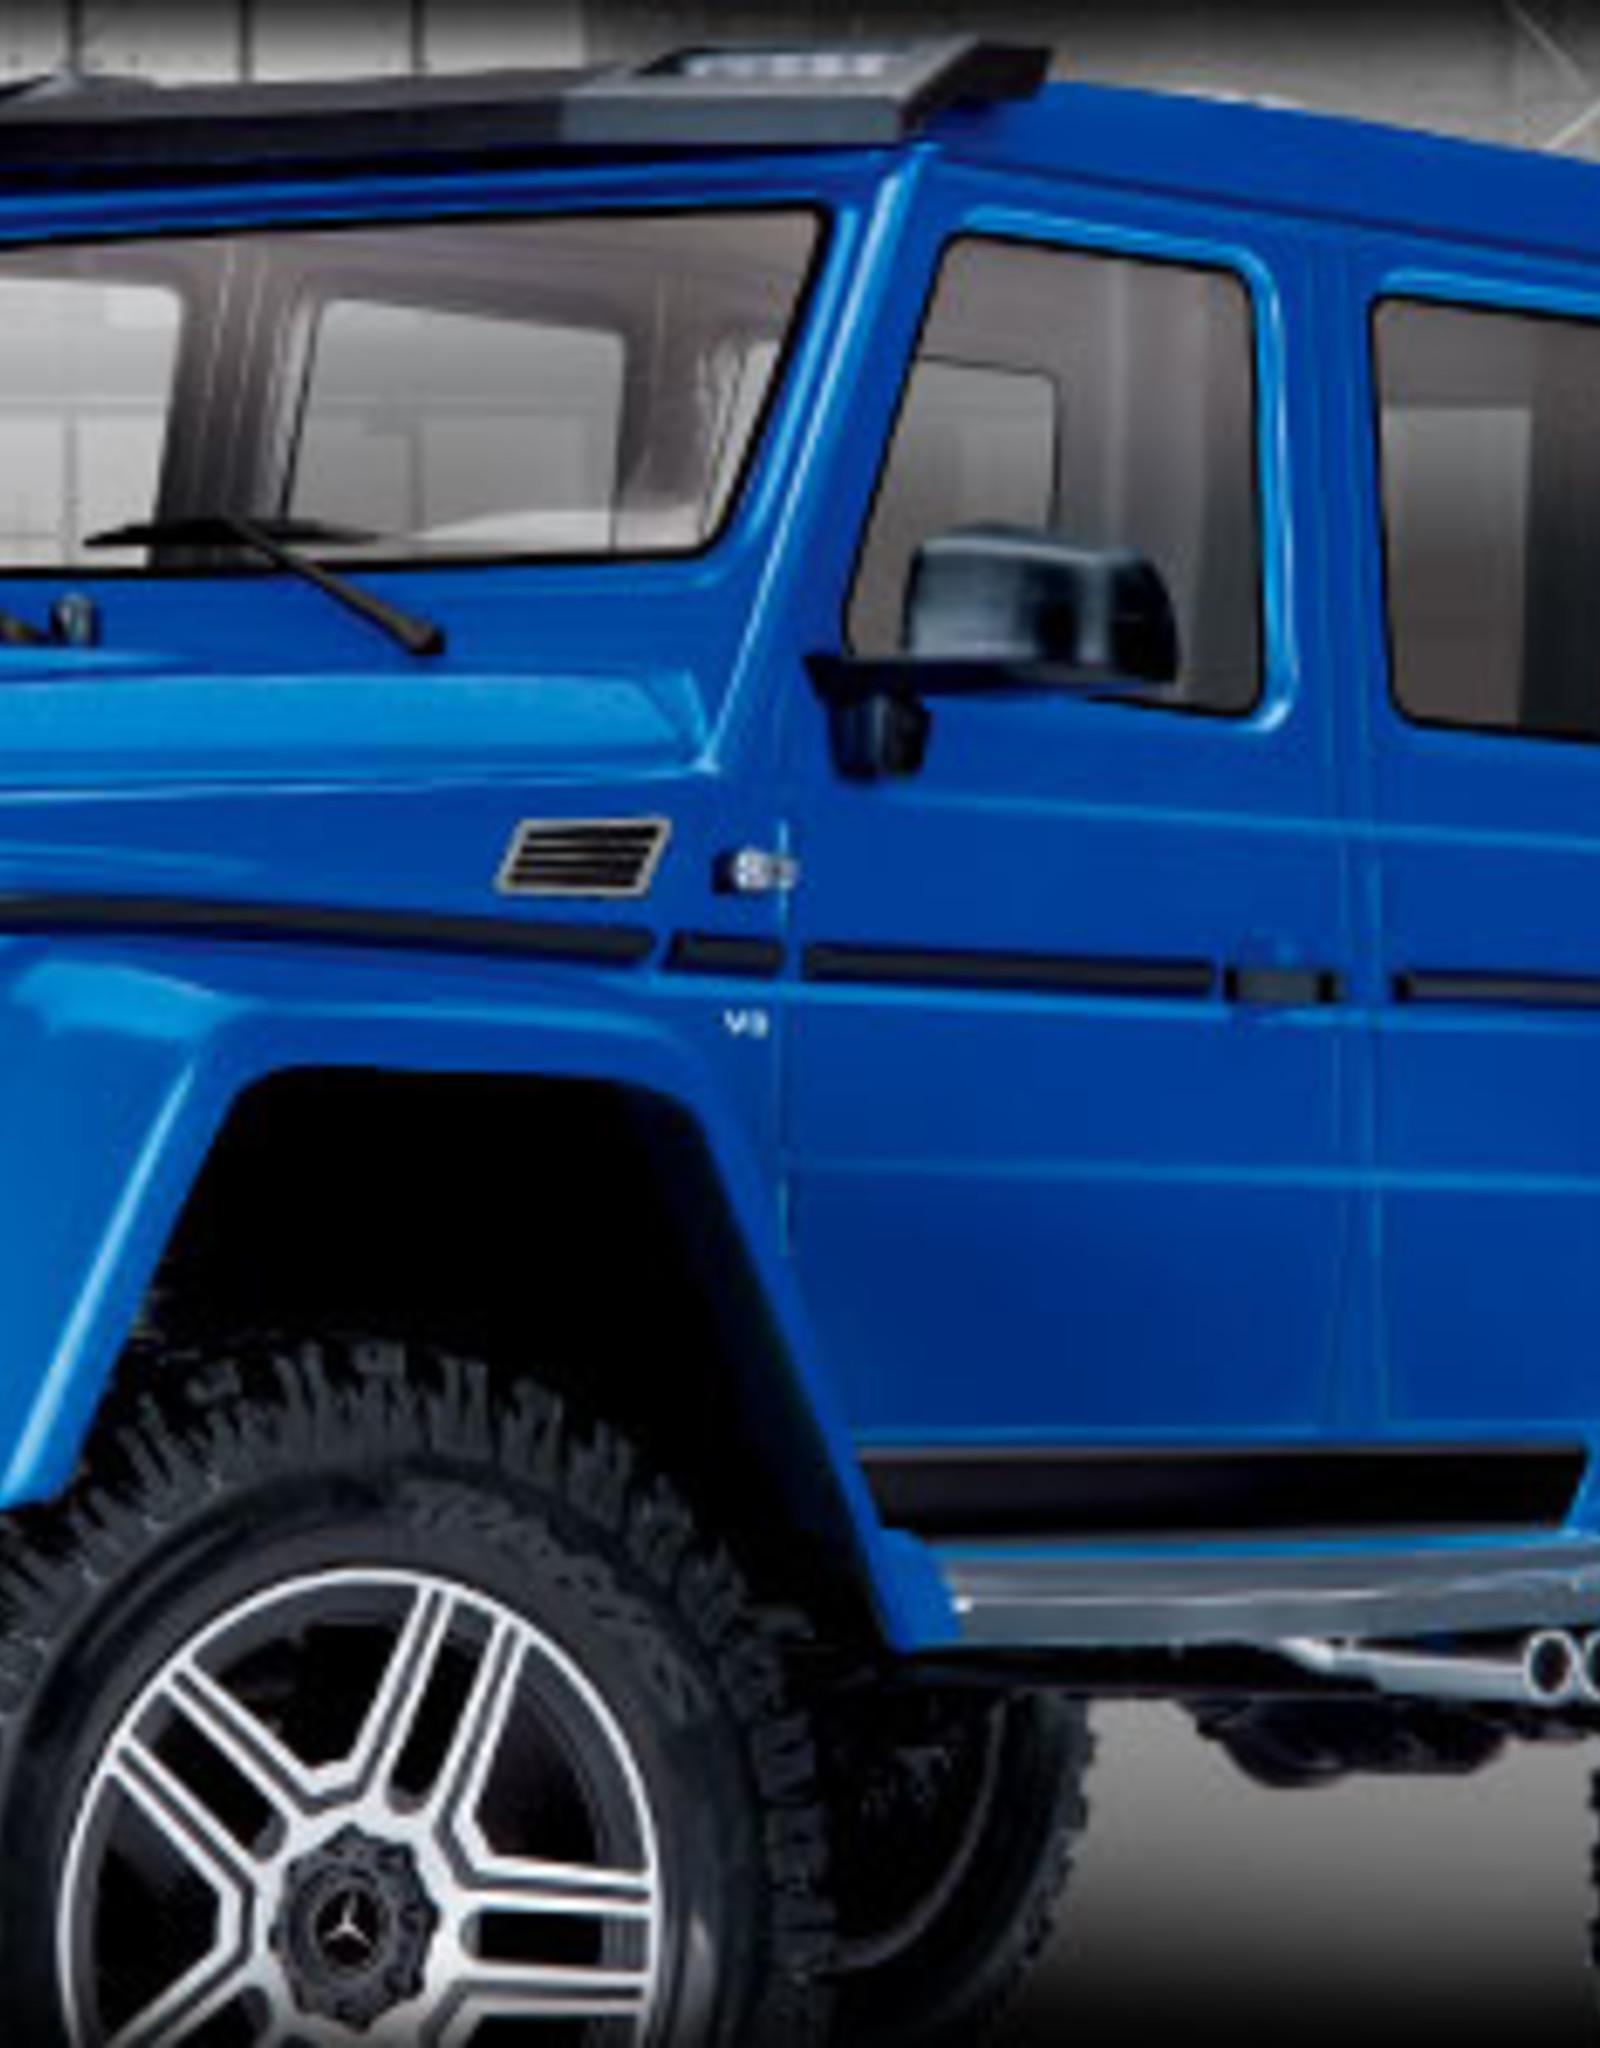 Traxxas Traxxas TRX-4 Mercedes-Benz G 500 4x4²